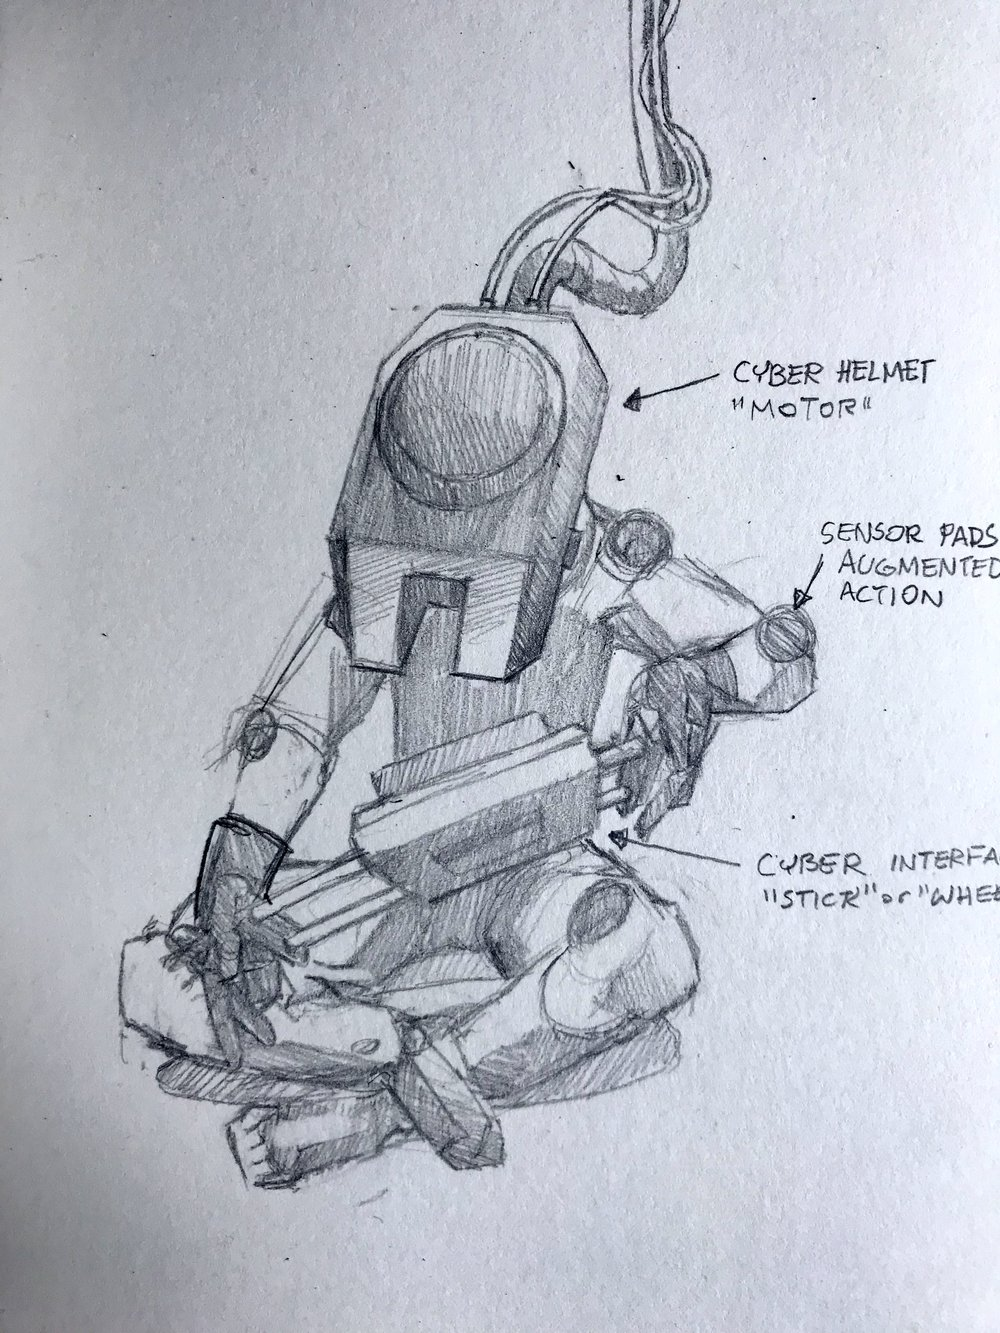 Crew Member preparing for cyber space voyage.